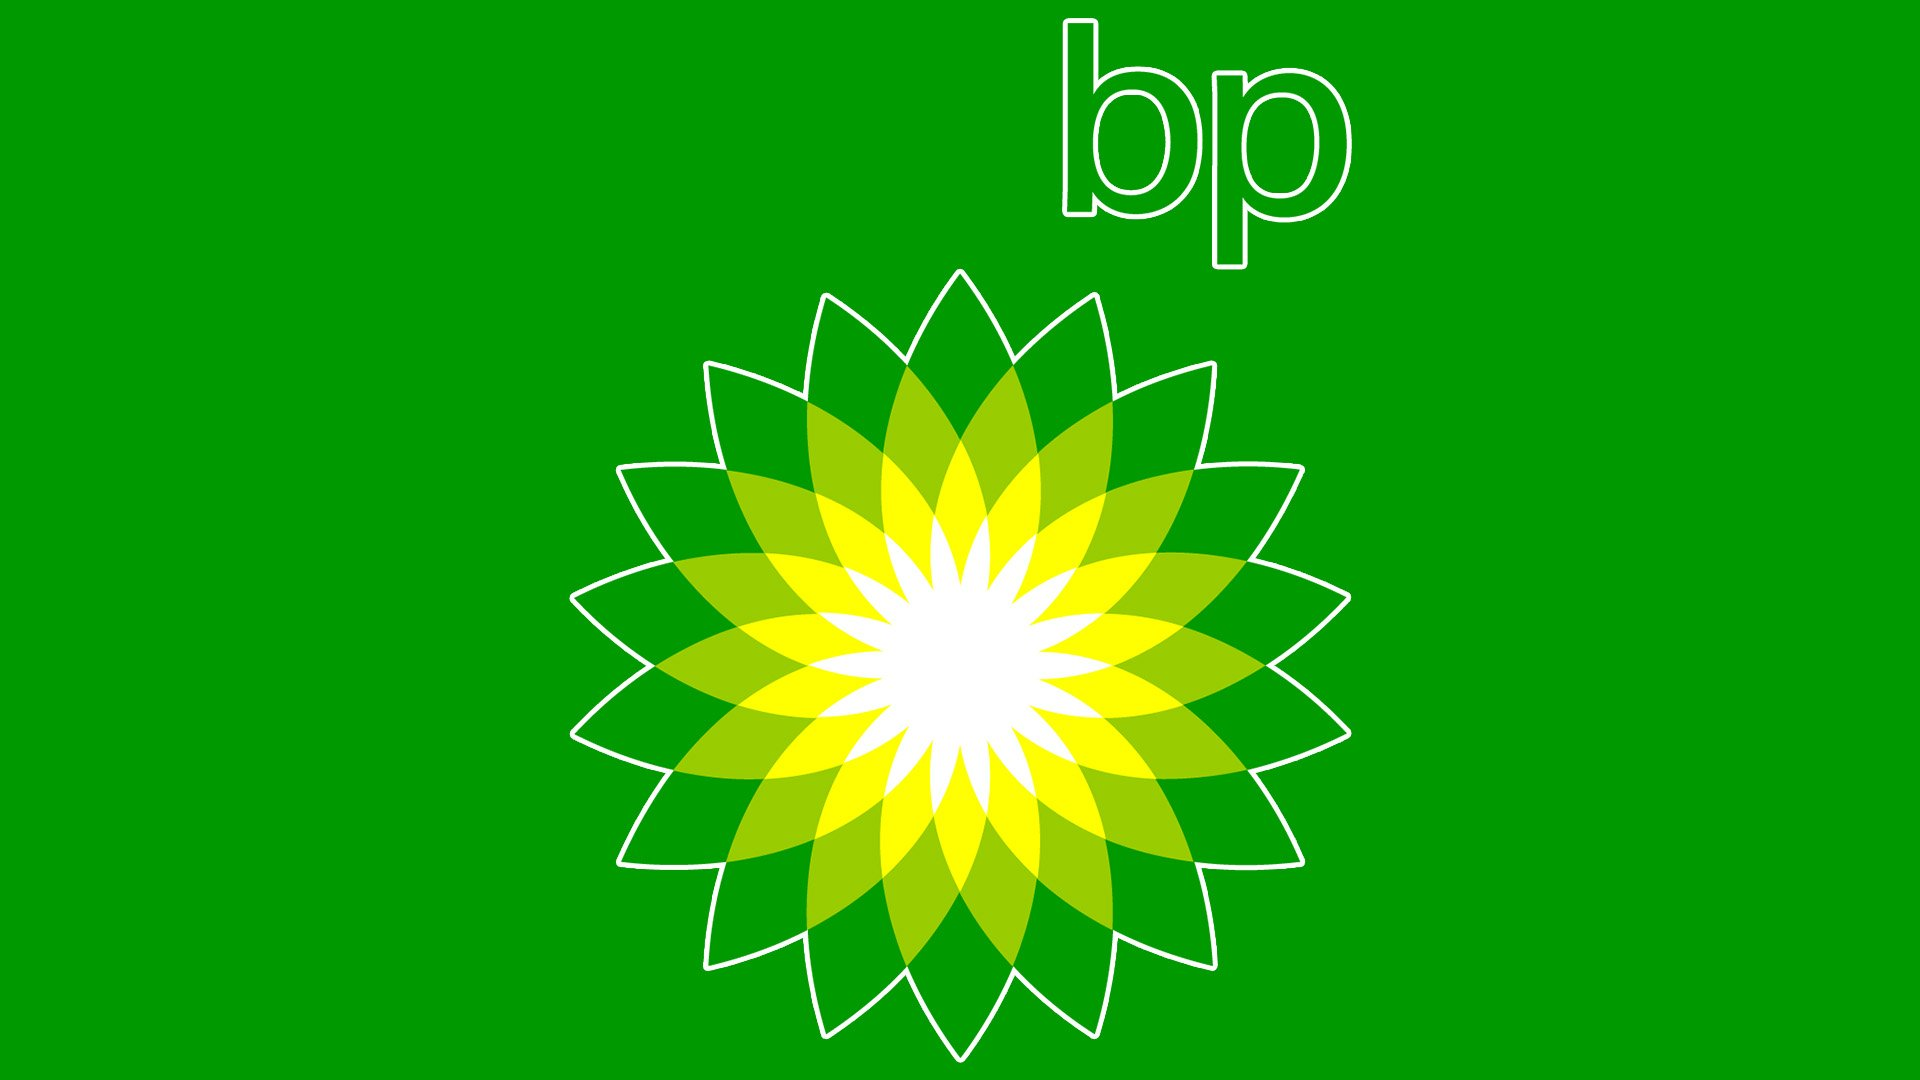 Bp Logo British Petroleum Symbol Meaning History And Evolution